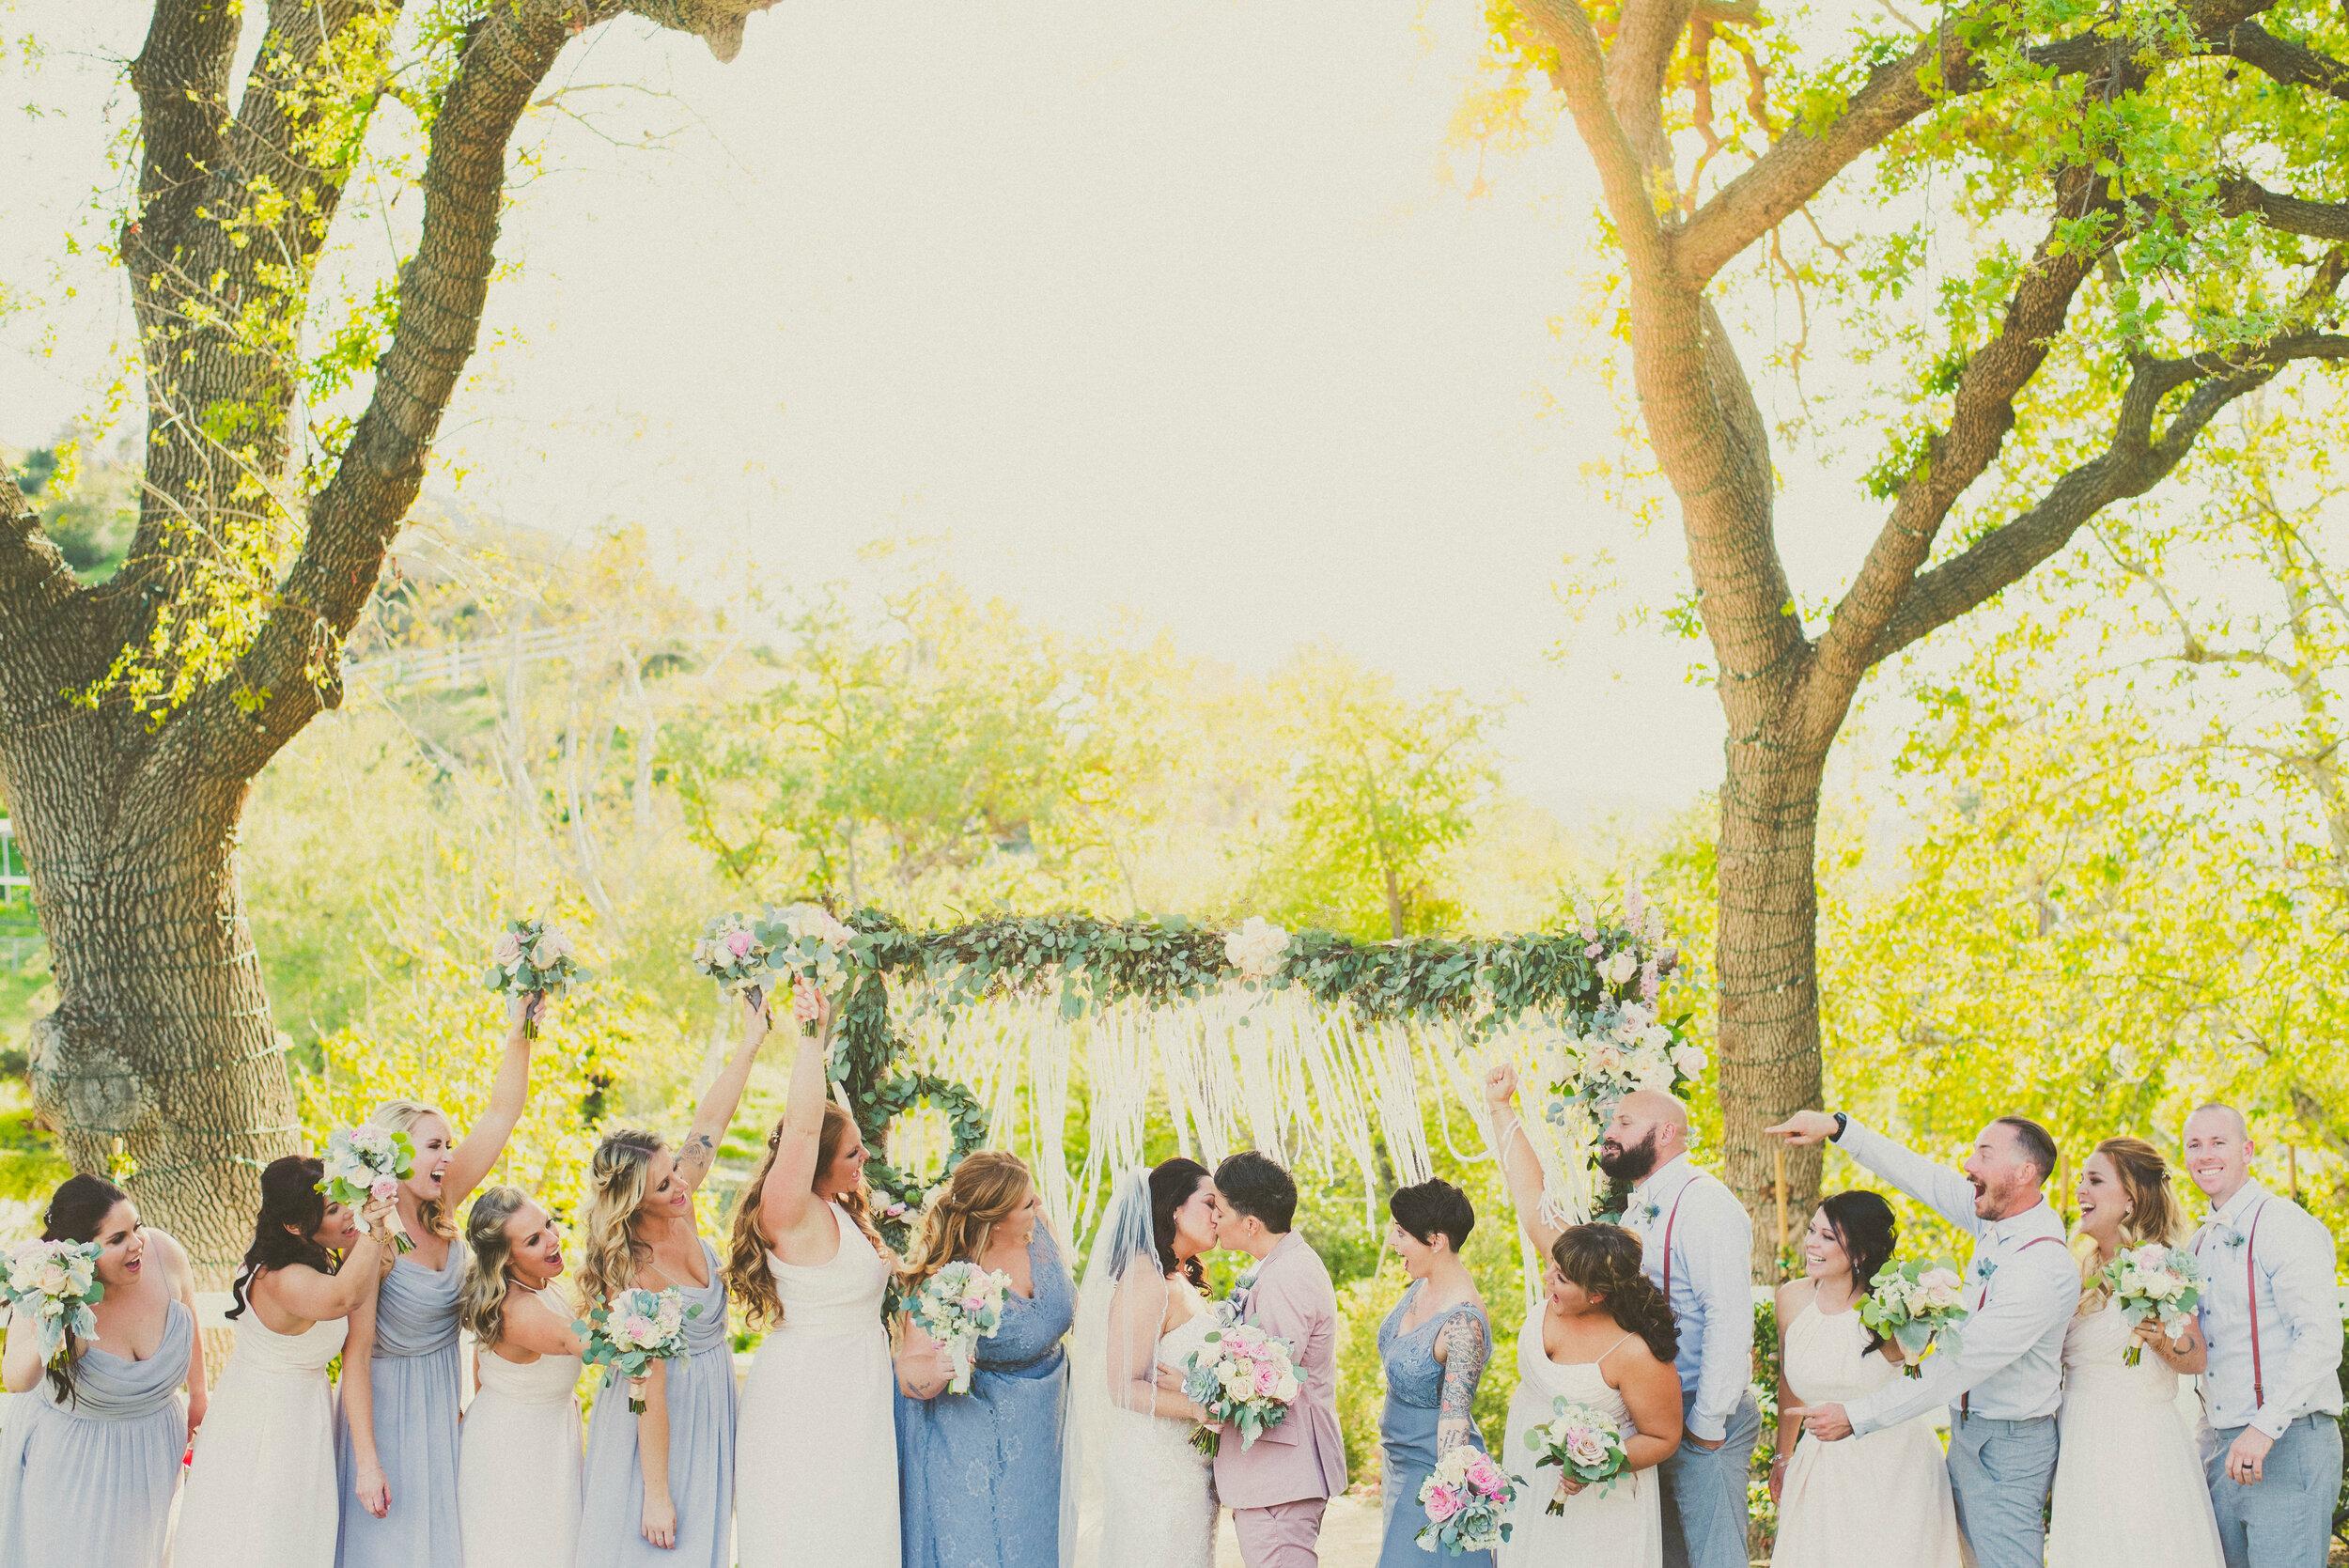 Demiglio Wedding - Wedding Party Portraits-102.jpg